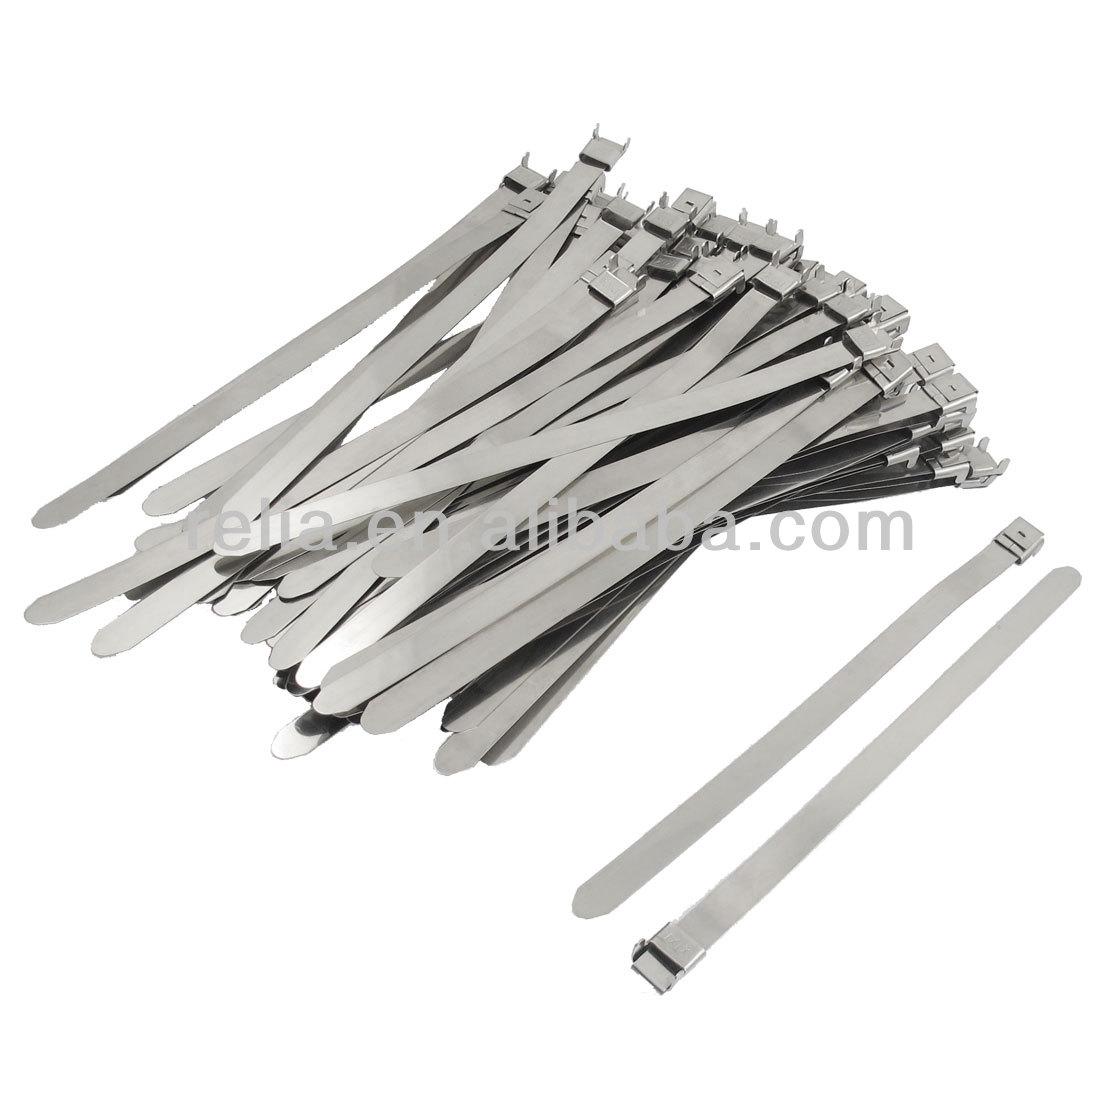 Alle Arten Von Metall-kabelbinder,Edelstahl Kabelbinder - Buy ...